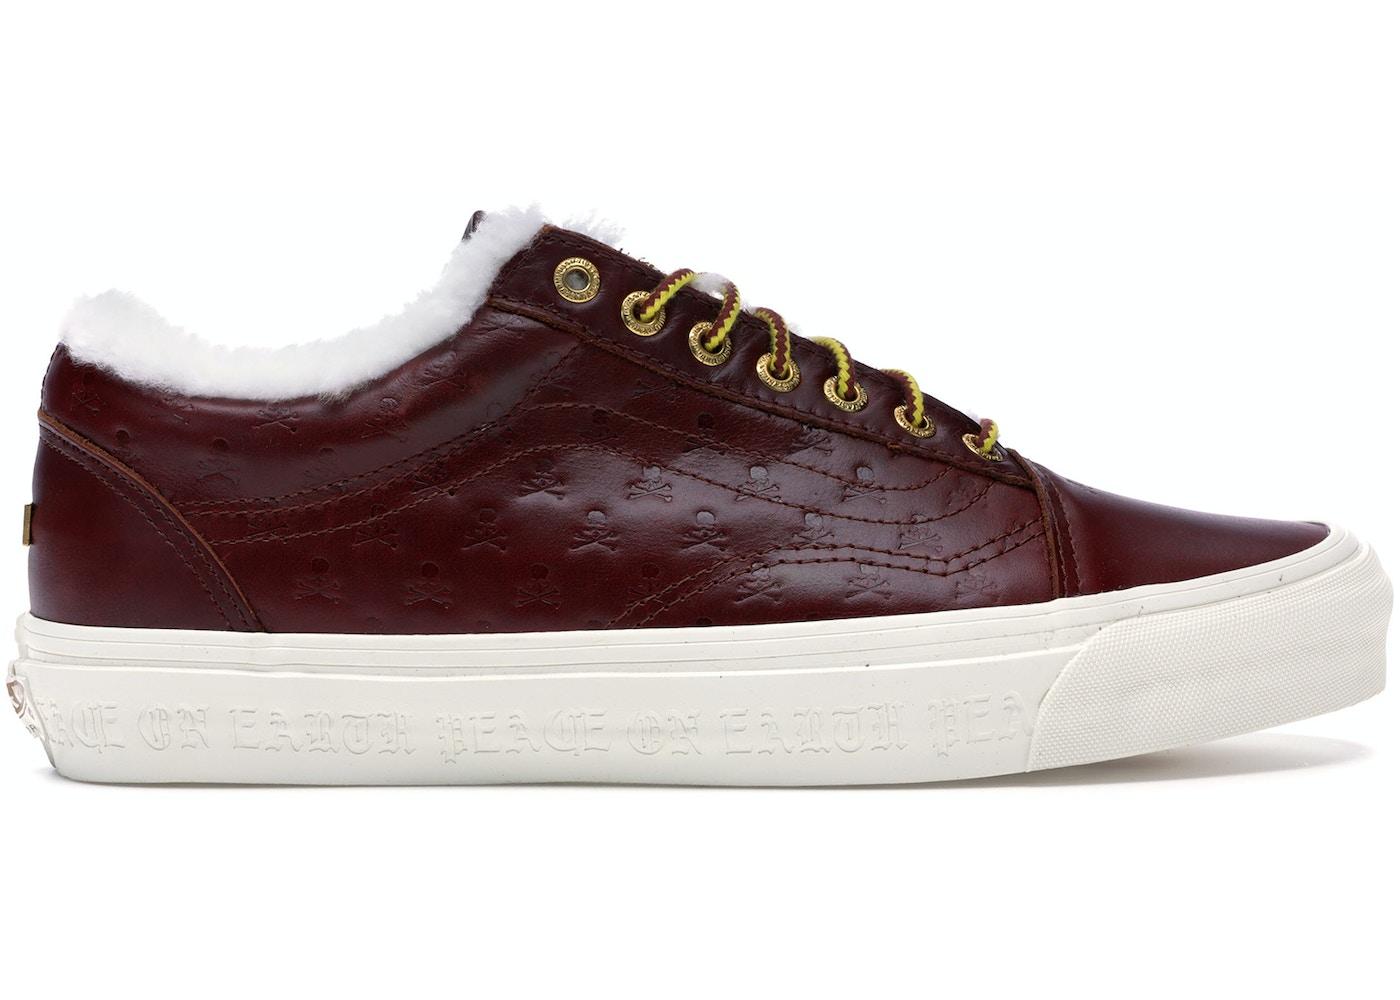 d840cfa7cbb197 Other Size 9 Shoes - Volatility